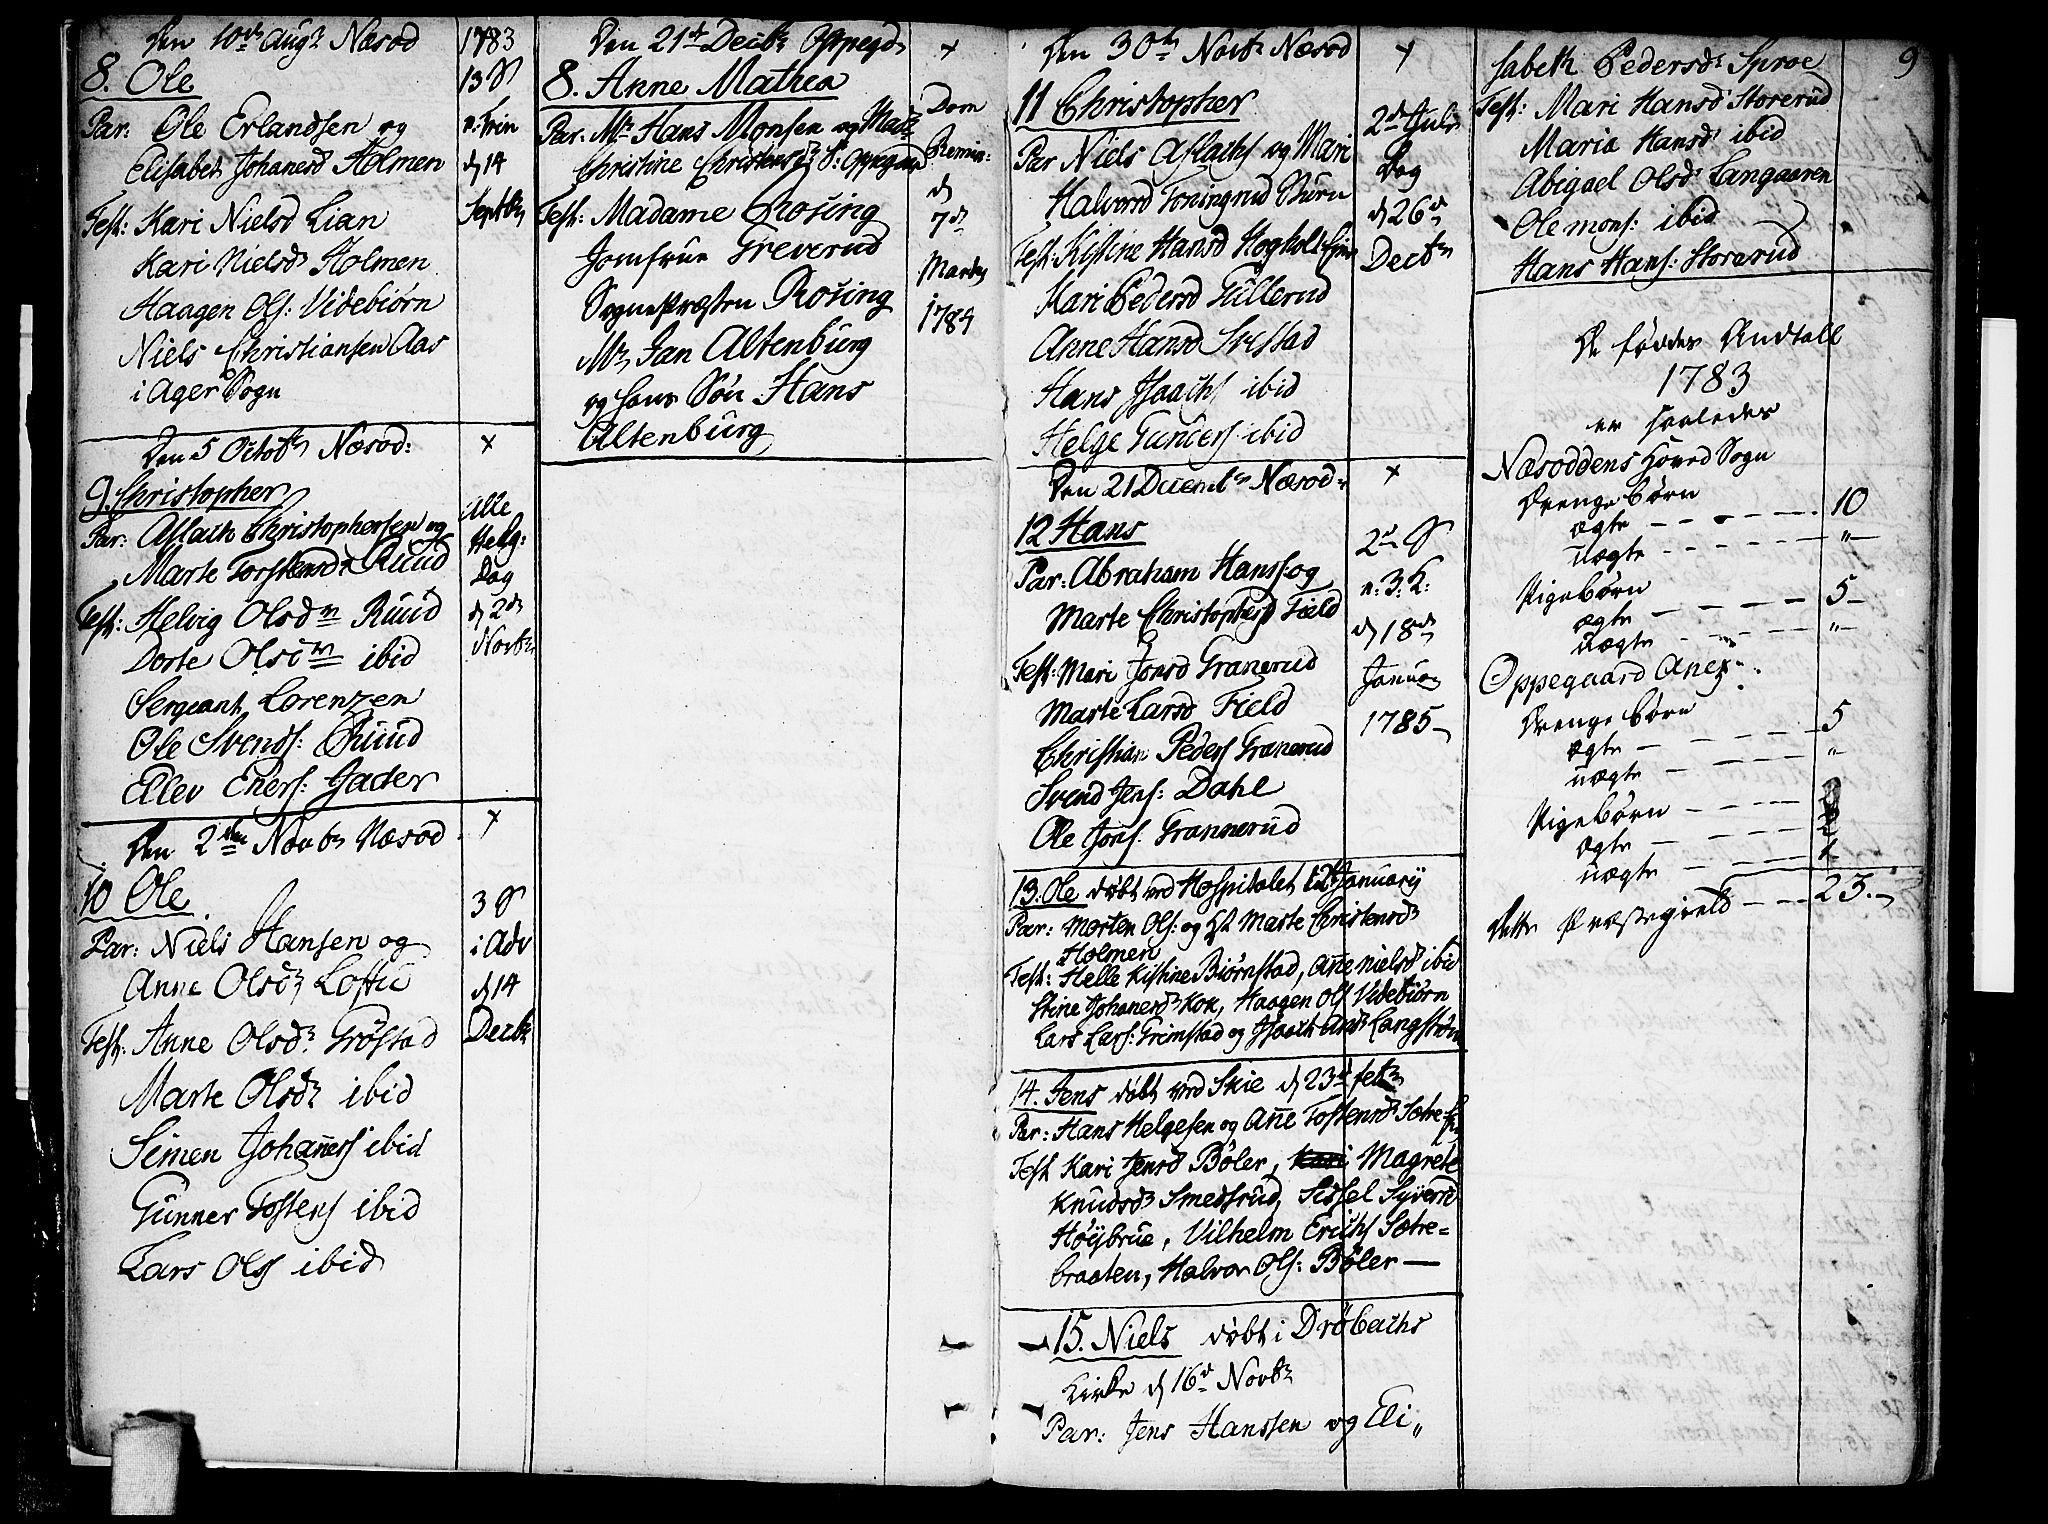 SAO, Nesodden prestekontor Kirkebøker, F/Fa/L0004: Ministerialbok nr. I 4, 1780-1792, s. 9